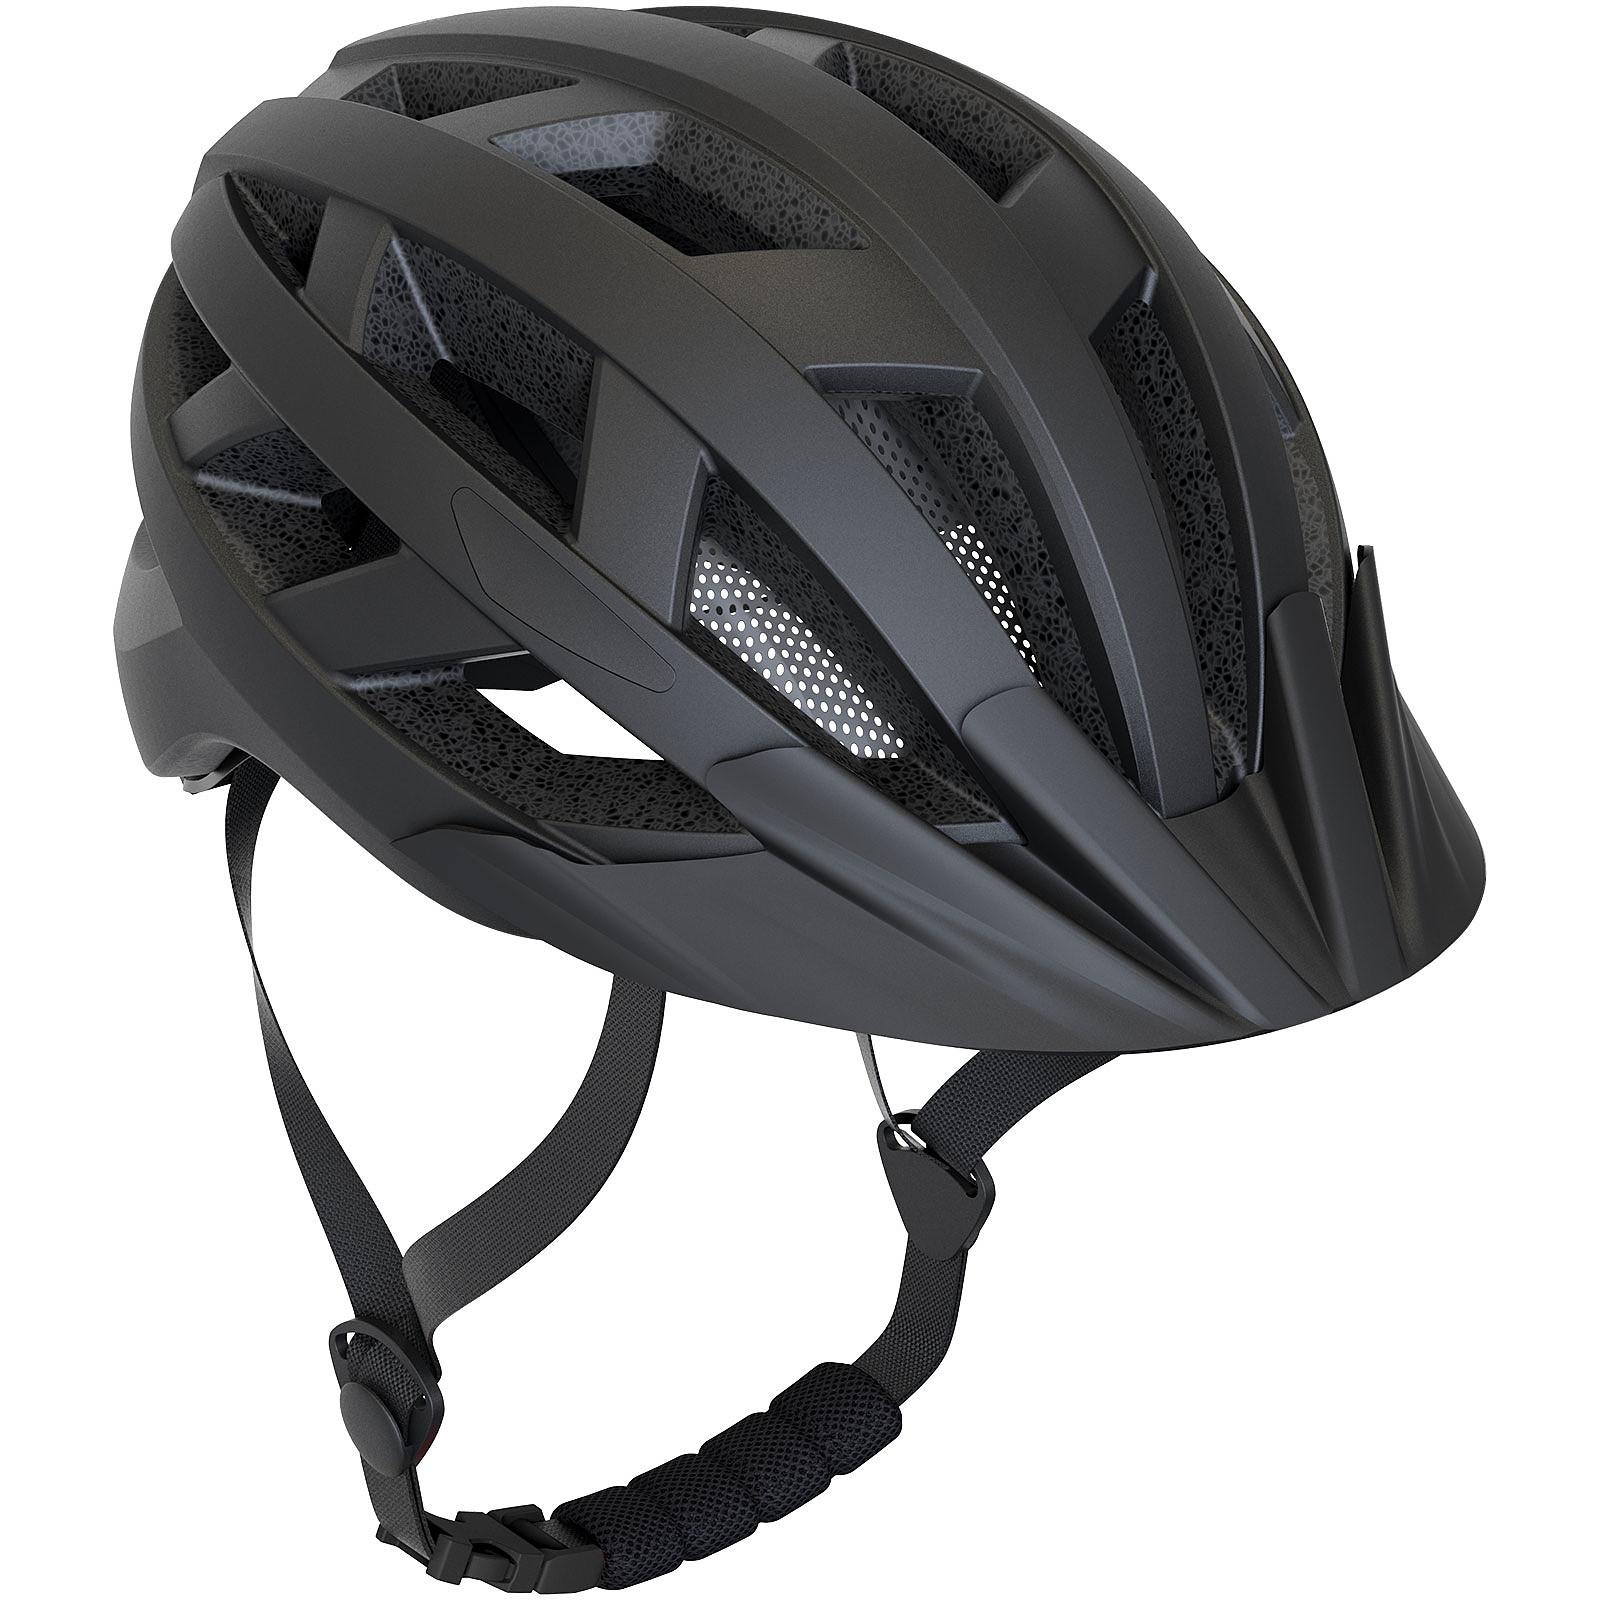 Made for Xiaomi LED Helmet (M)